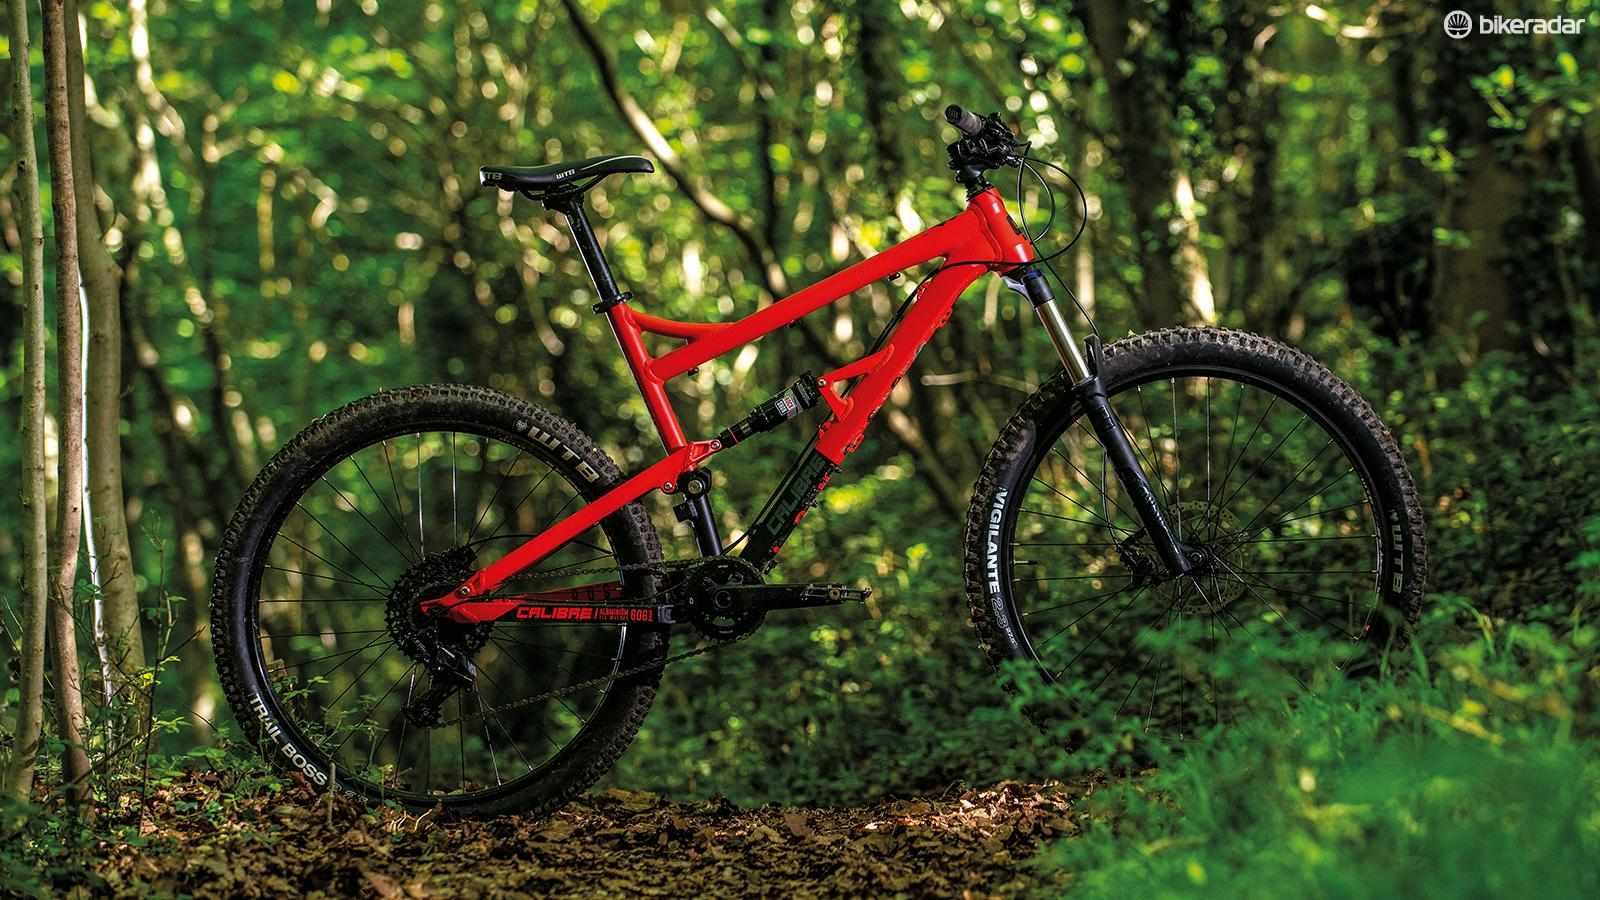 421ac381c8f Calibre bikes: latest reviews, news and buying advice - BikeRadar